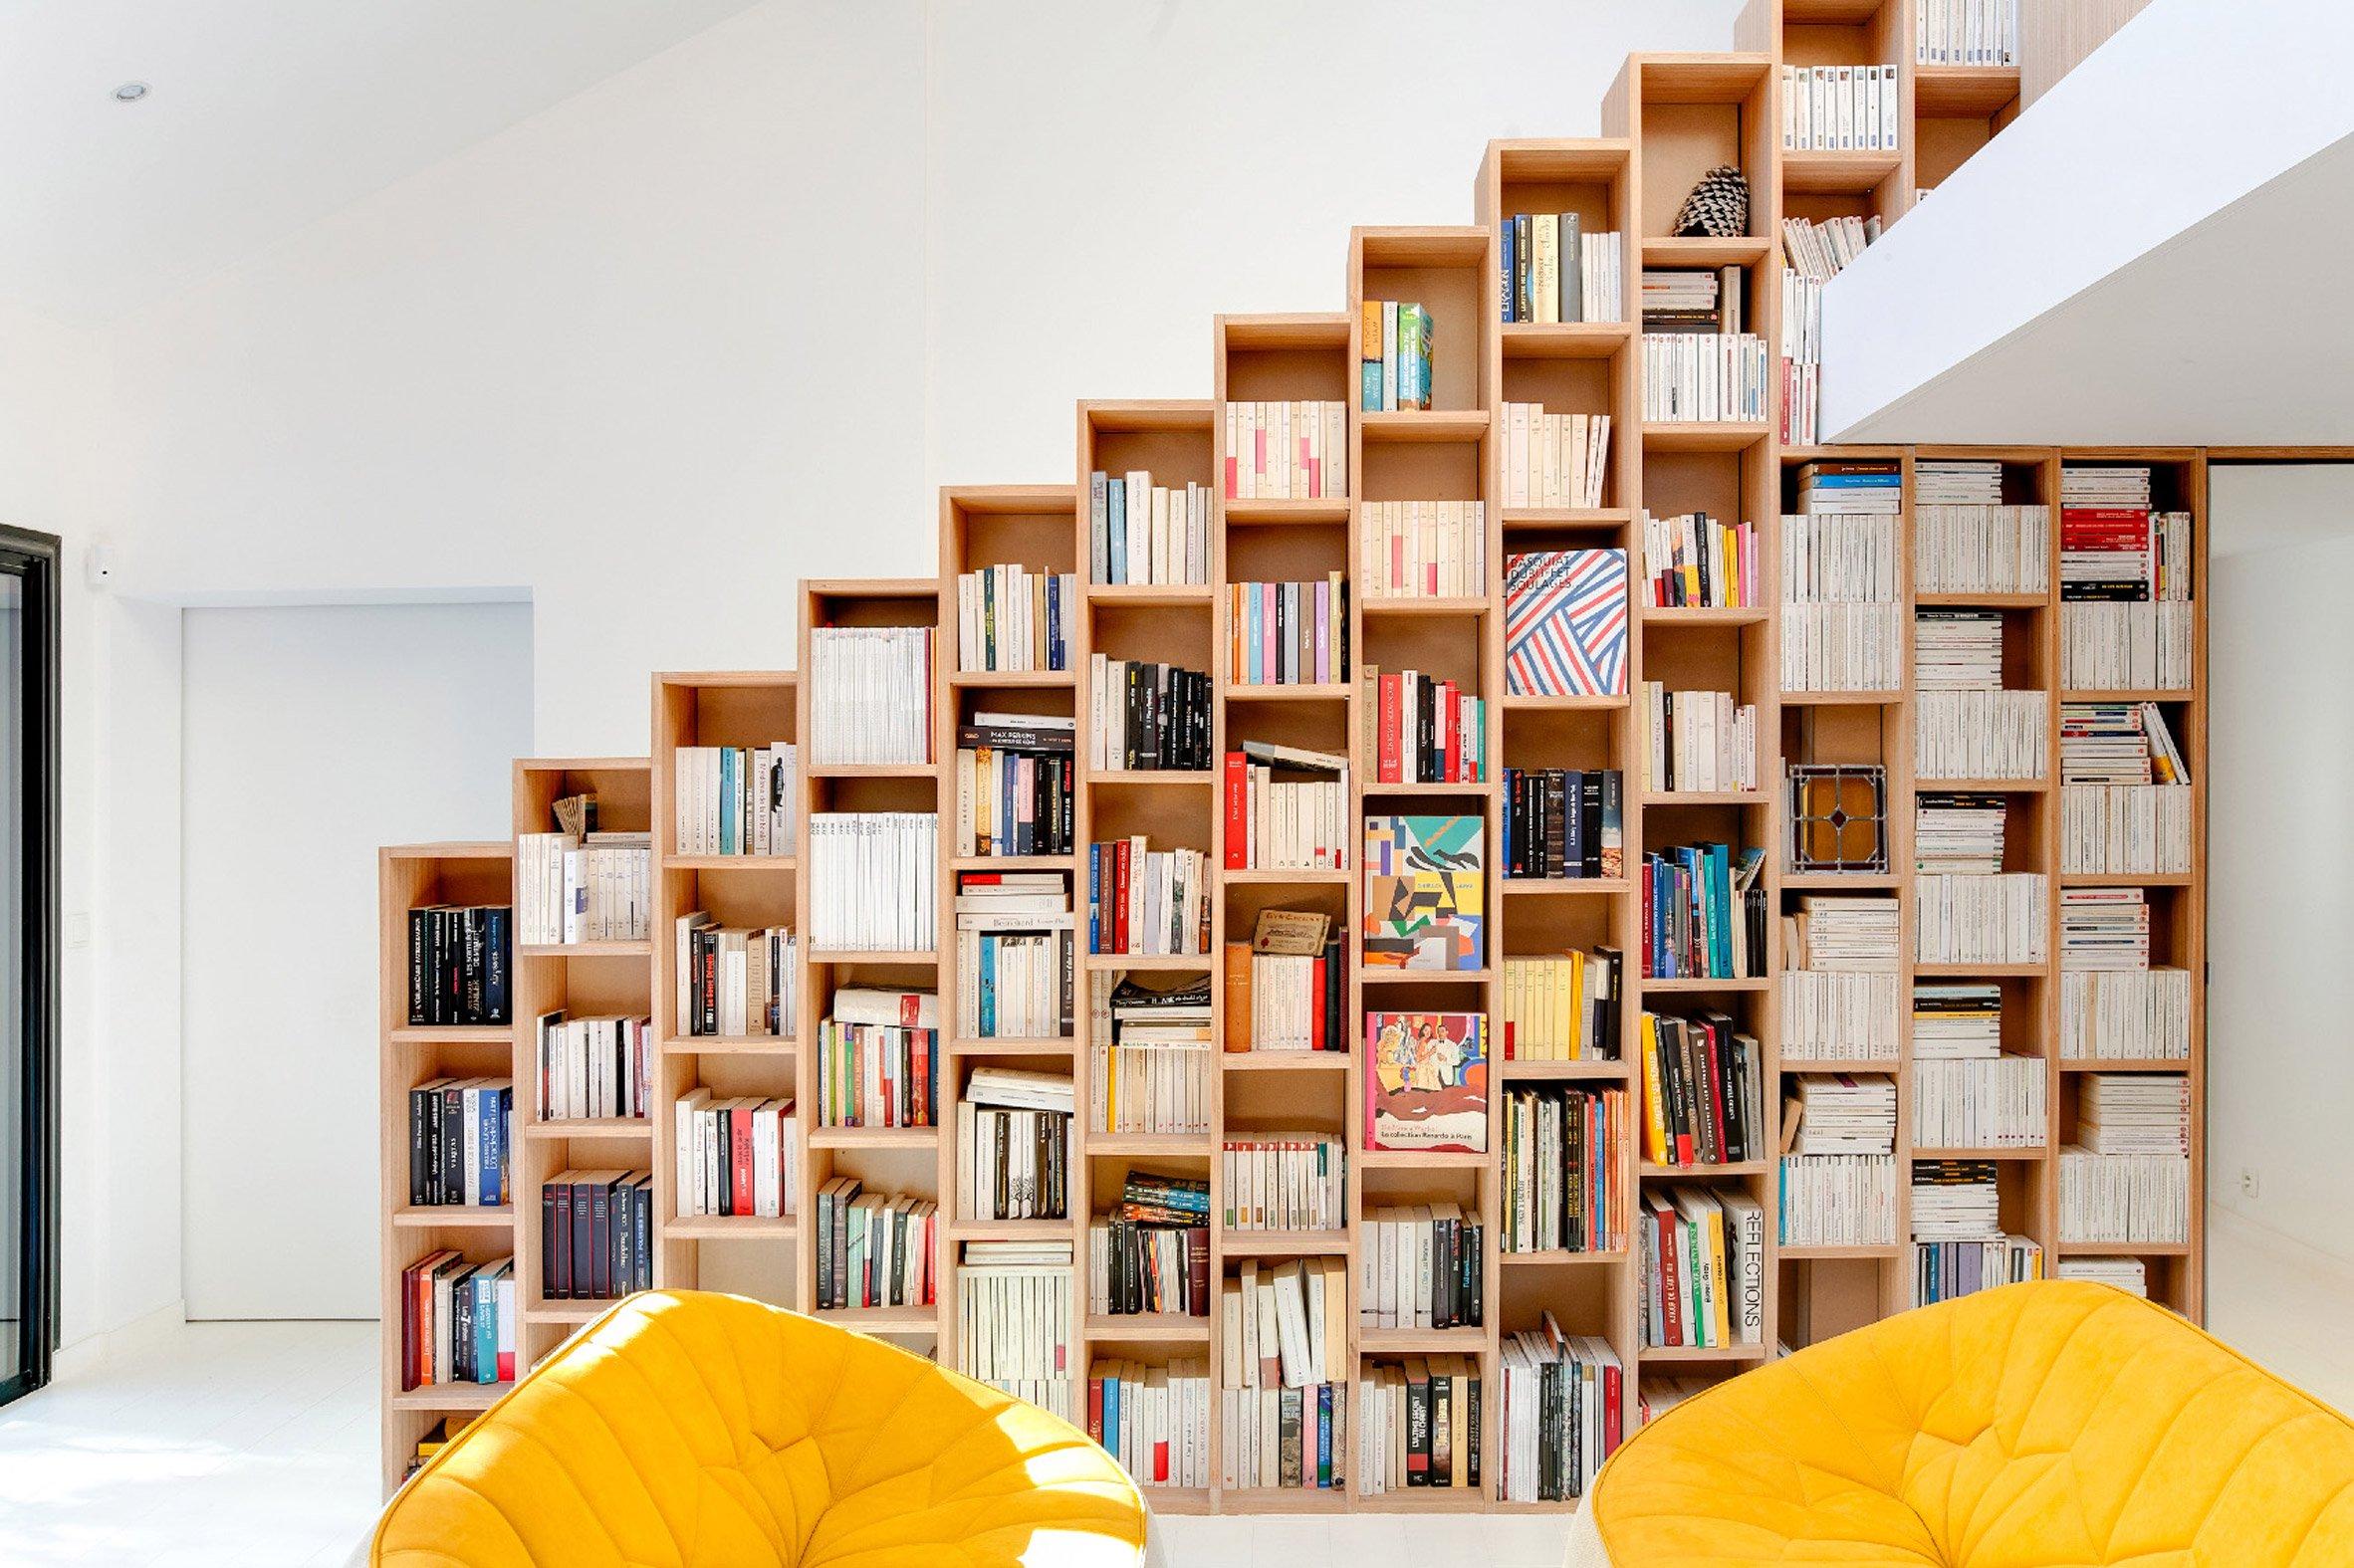 bookshelf-house-andrea-mosca-interior-paris-_dezeen_2364_col_5